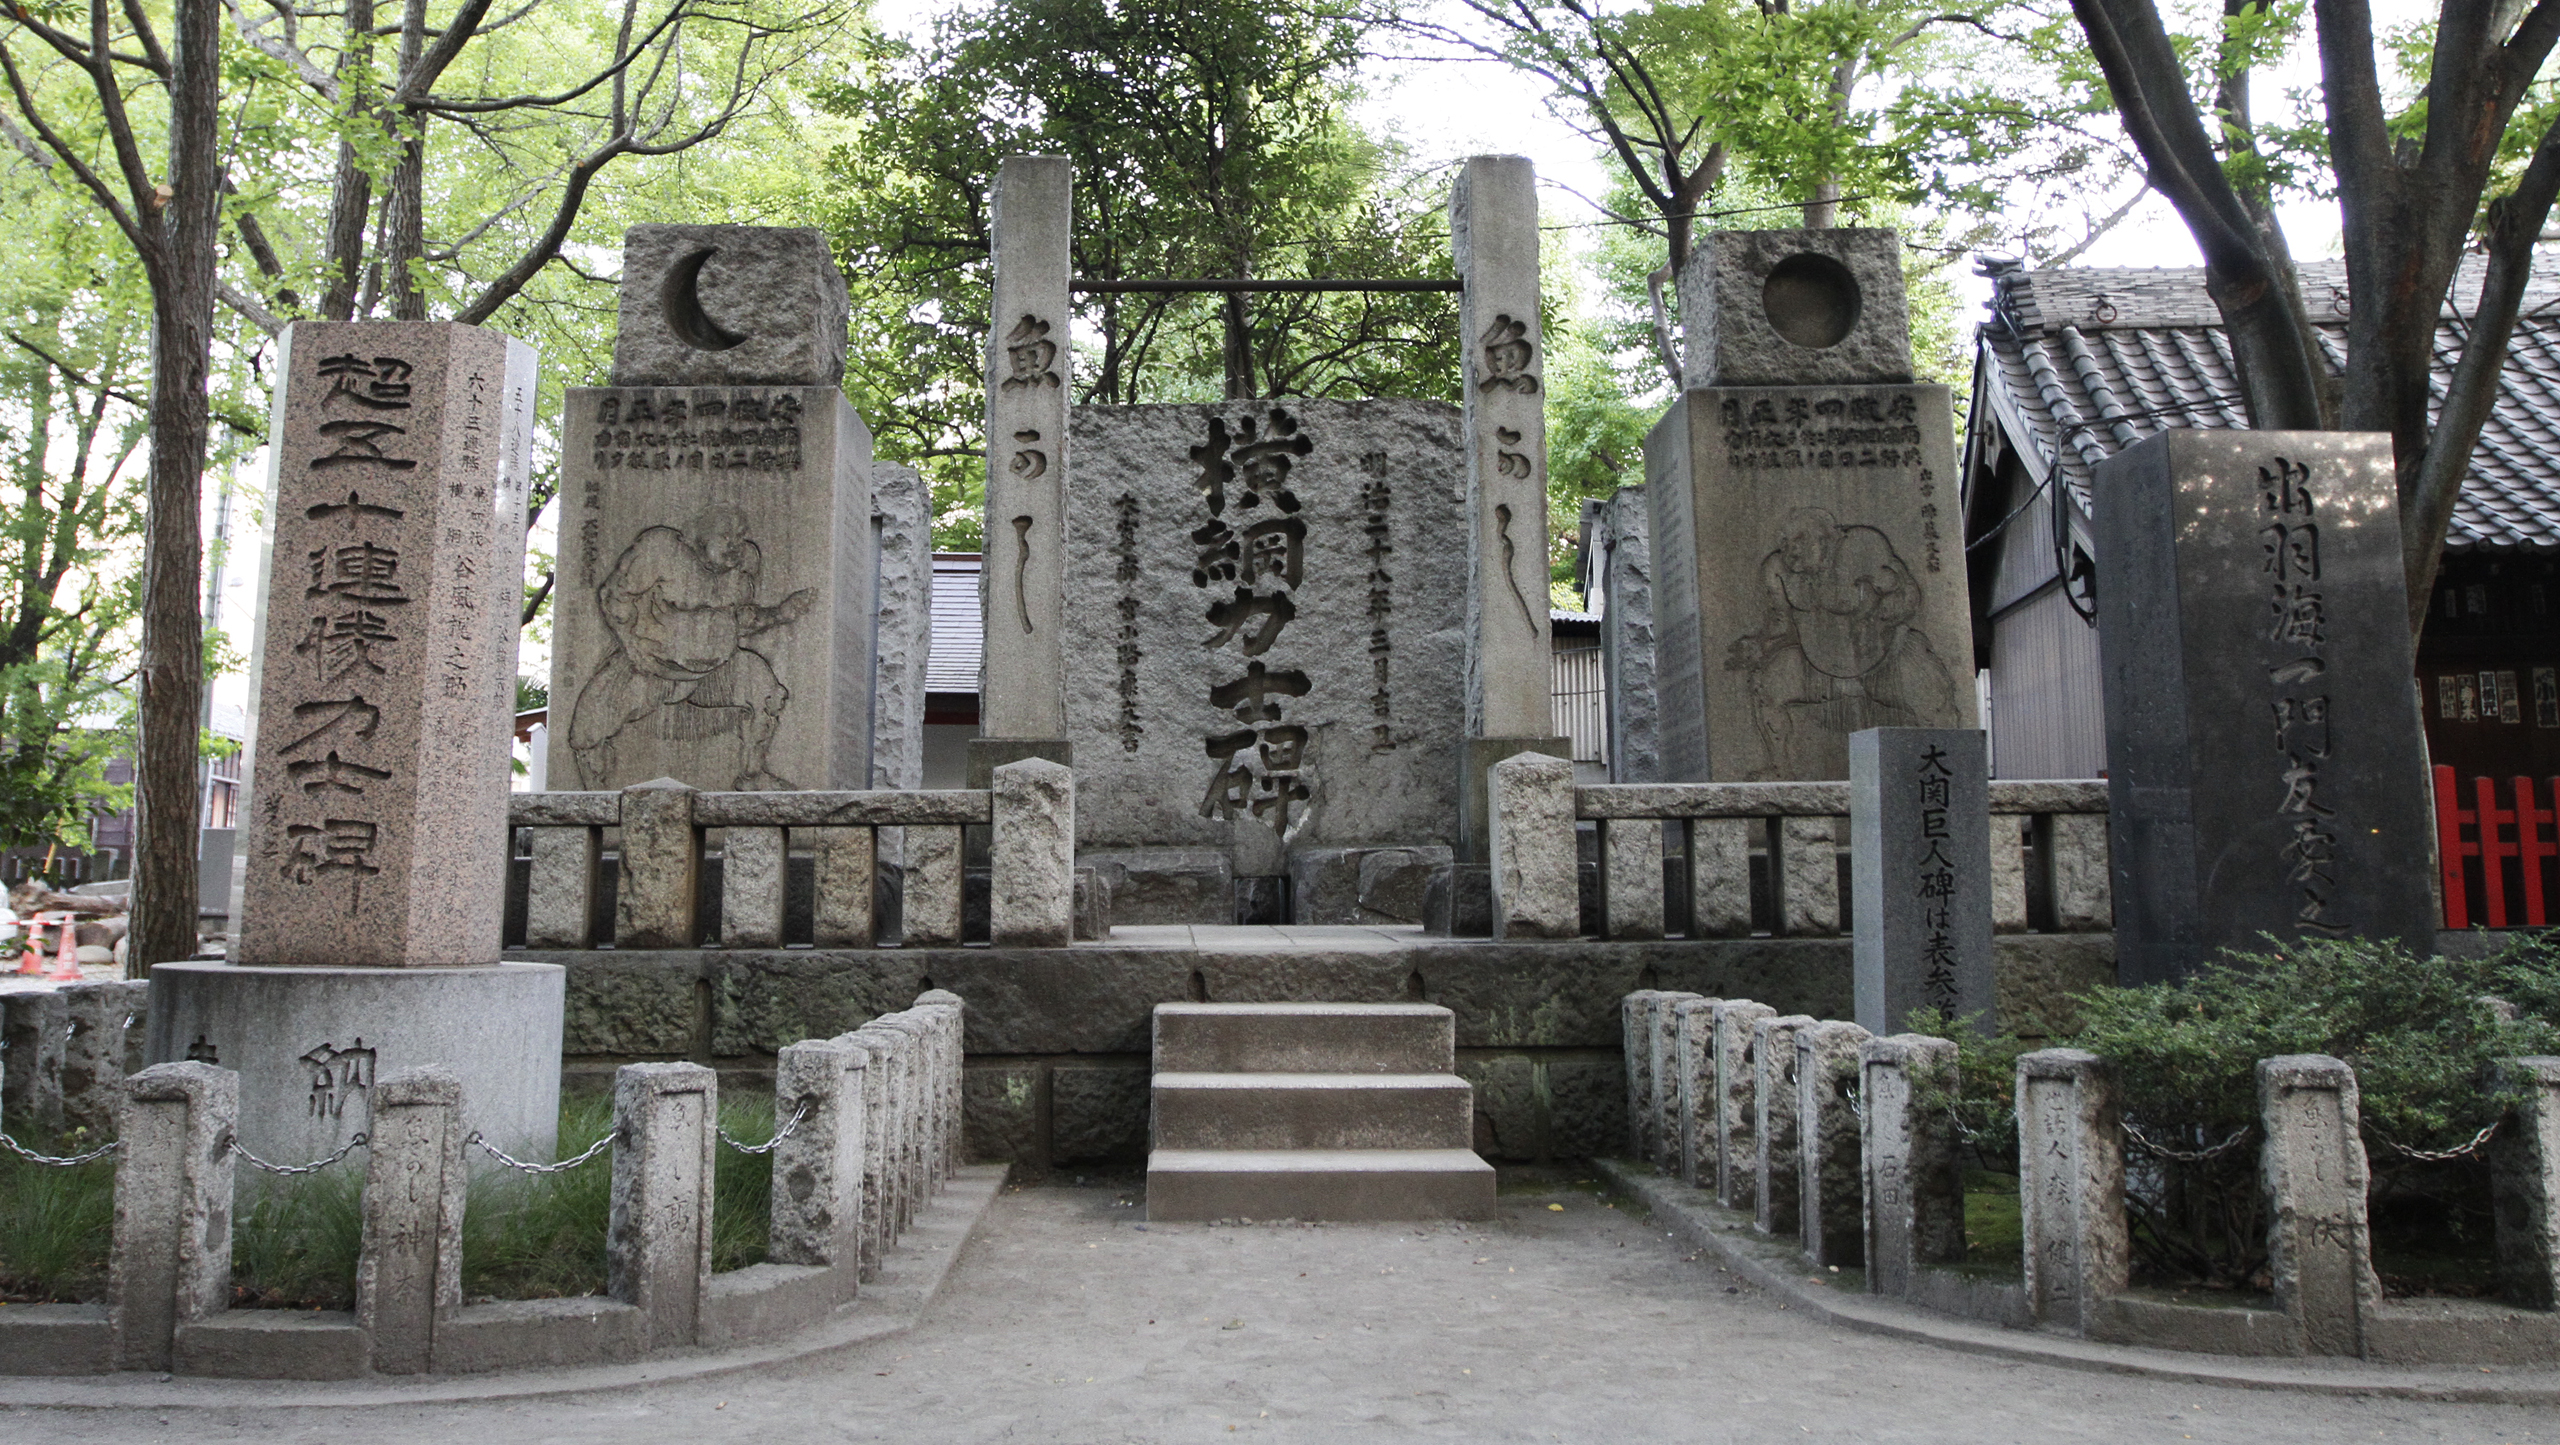 20170611-yokozuna-kobeveses-kisenosato6.jpg